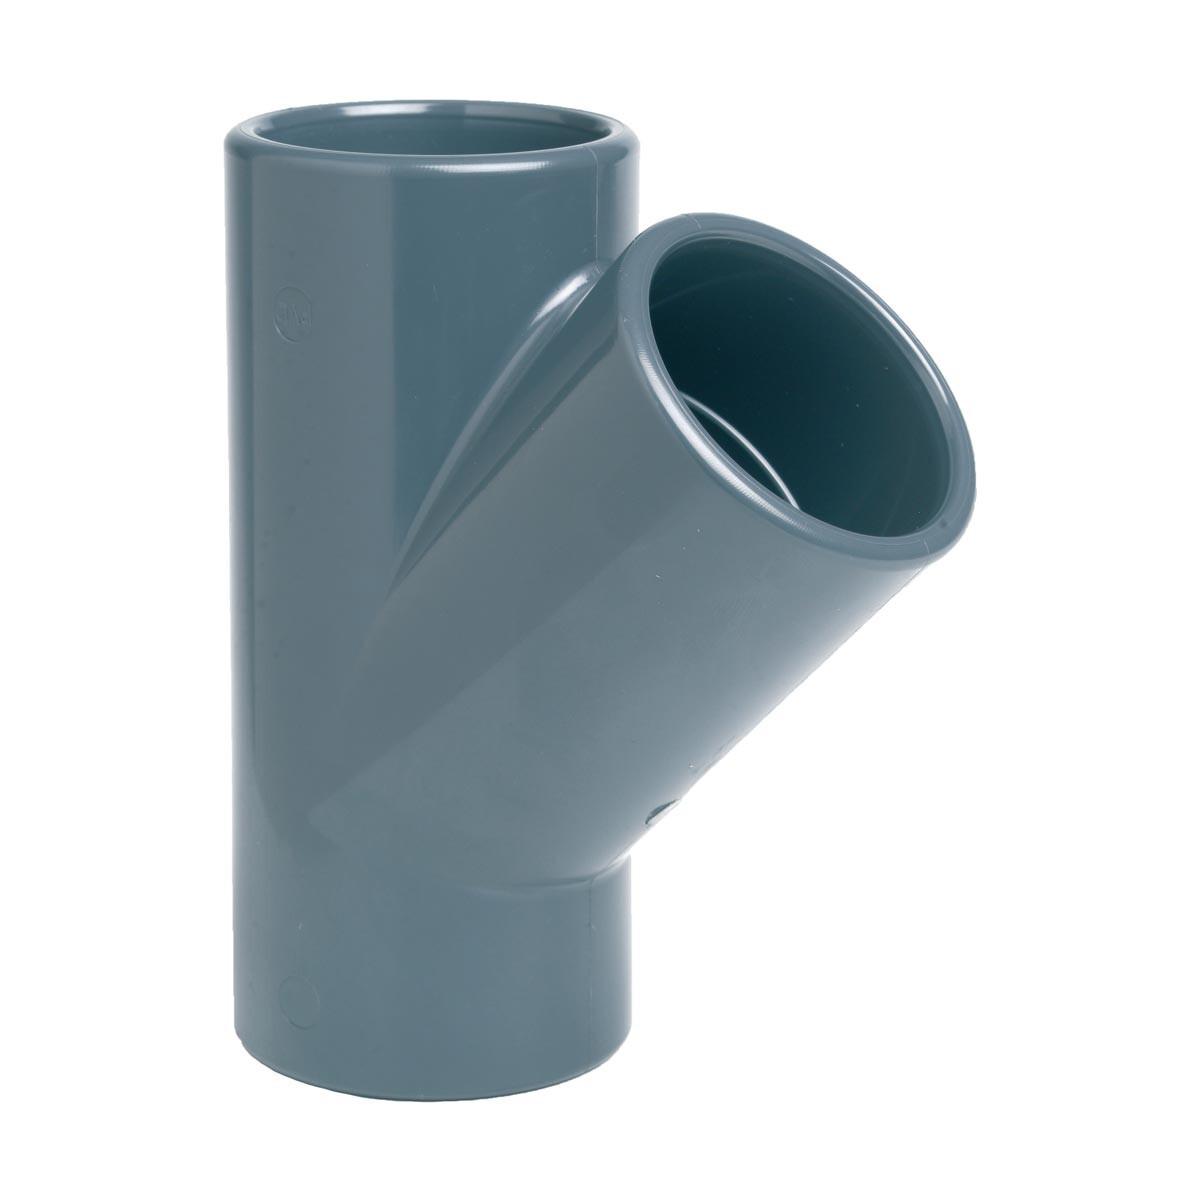 Тройник клеевой 45° EFFAST d32 мм (RDRTYD0320)